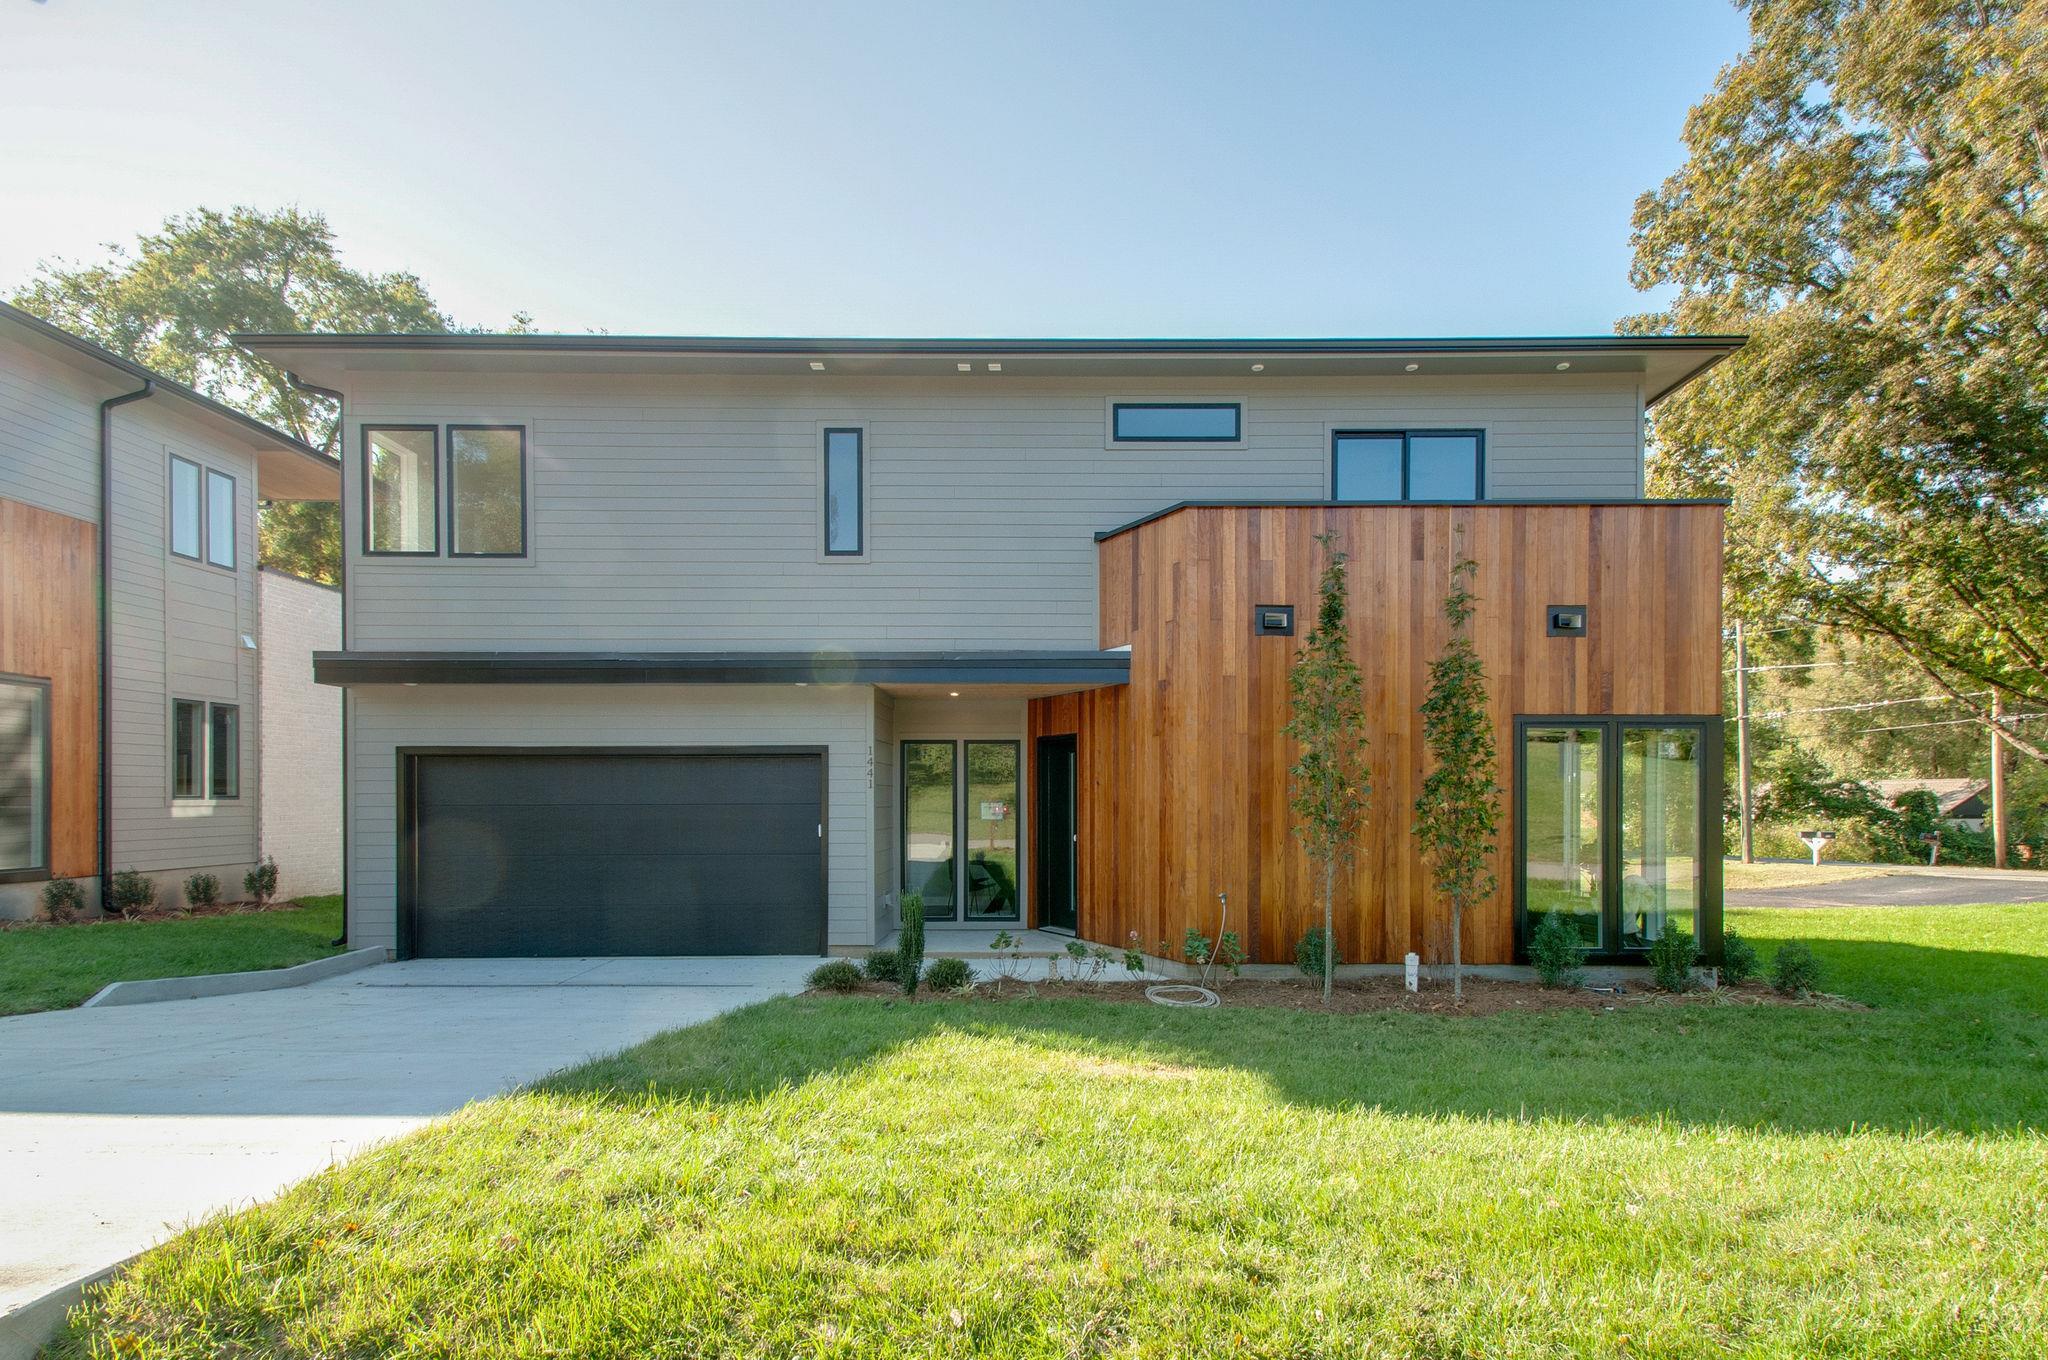 1439 Huffine St, Nashville, TN 37216 - Nashville, TN real estate listing